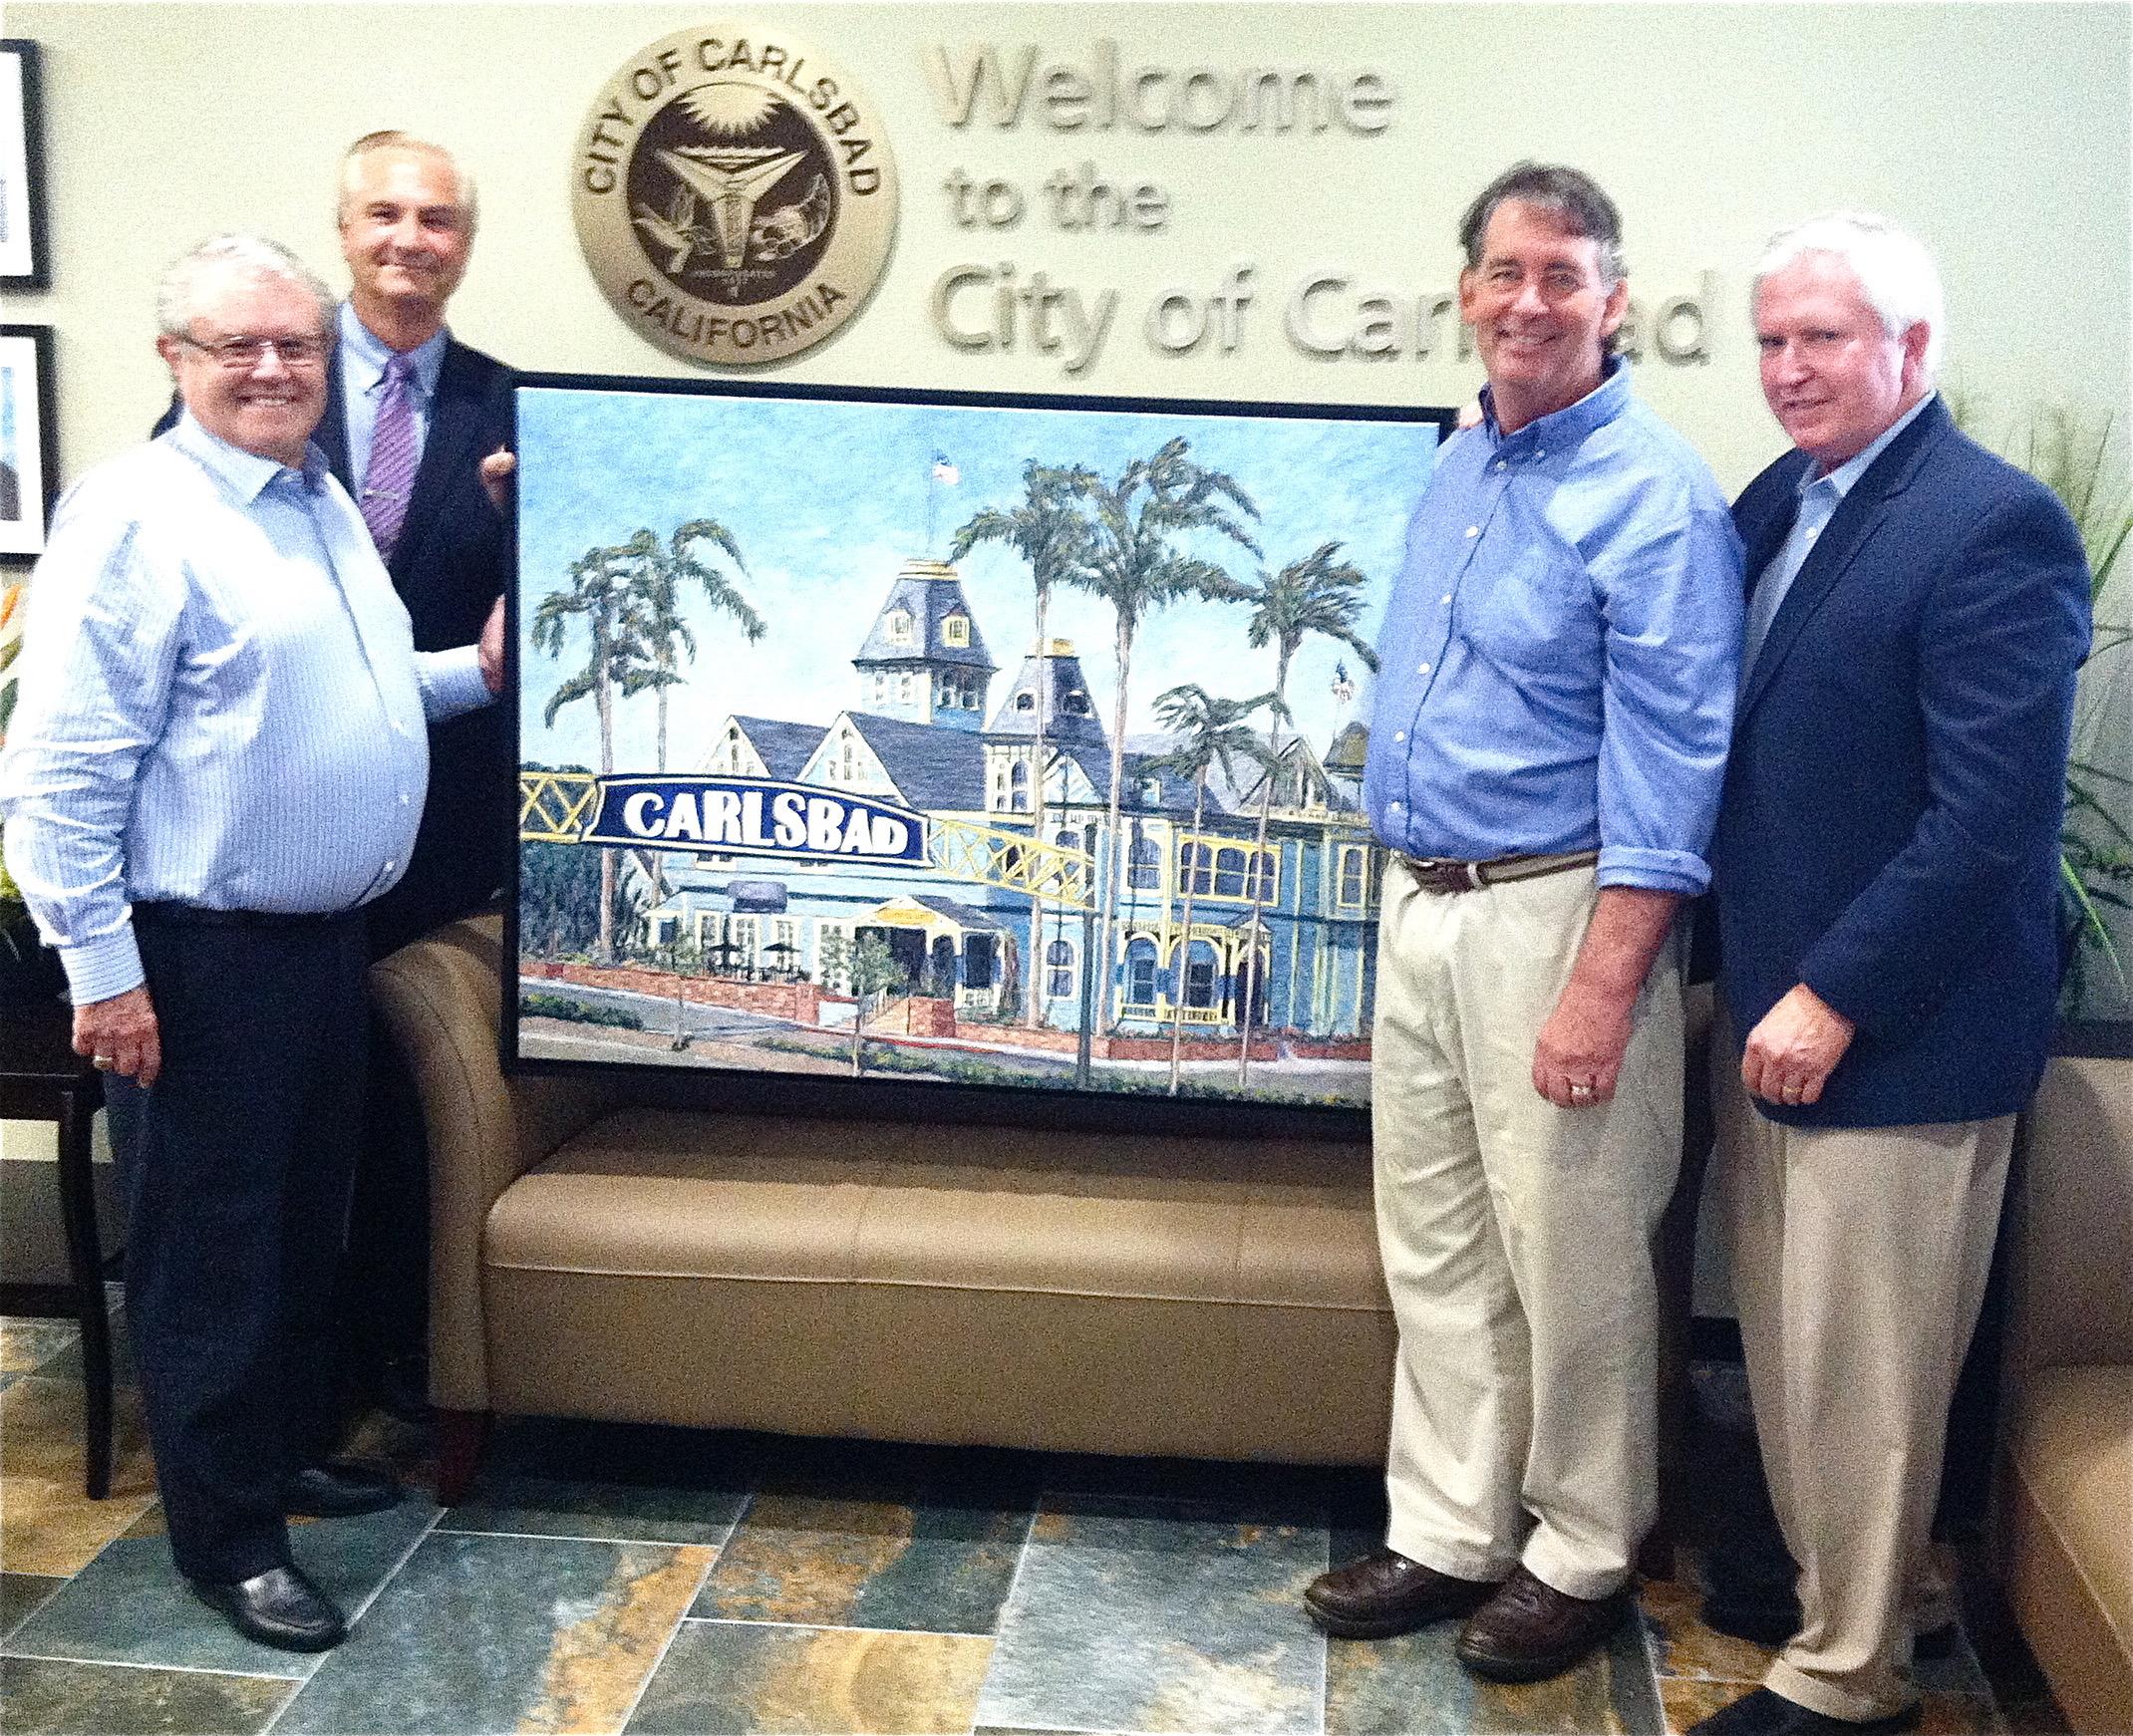 At Carlsbad City Hall: Mayor Matt Hall, Carlton Lund, Leigh, and Craig Lindholm